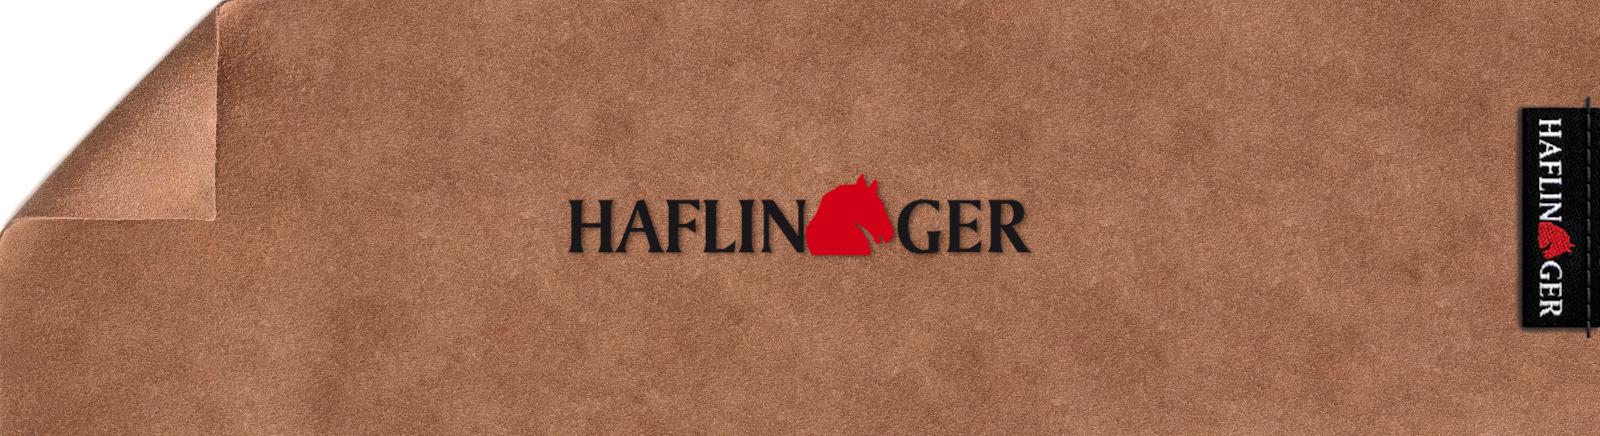 Juppen: Haflinger Hausschuhe für Mädchen und Jungen online shoppen